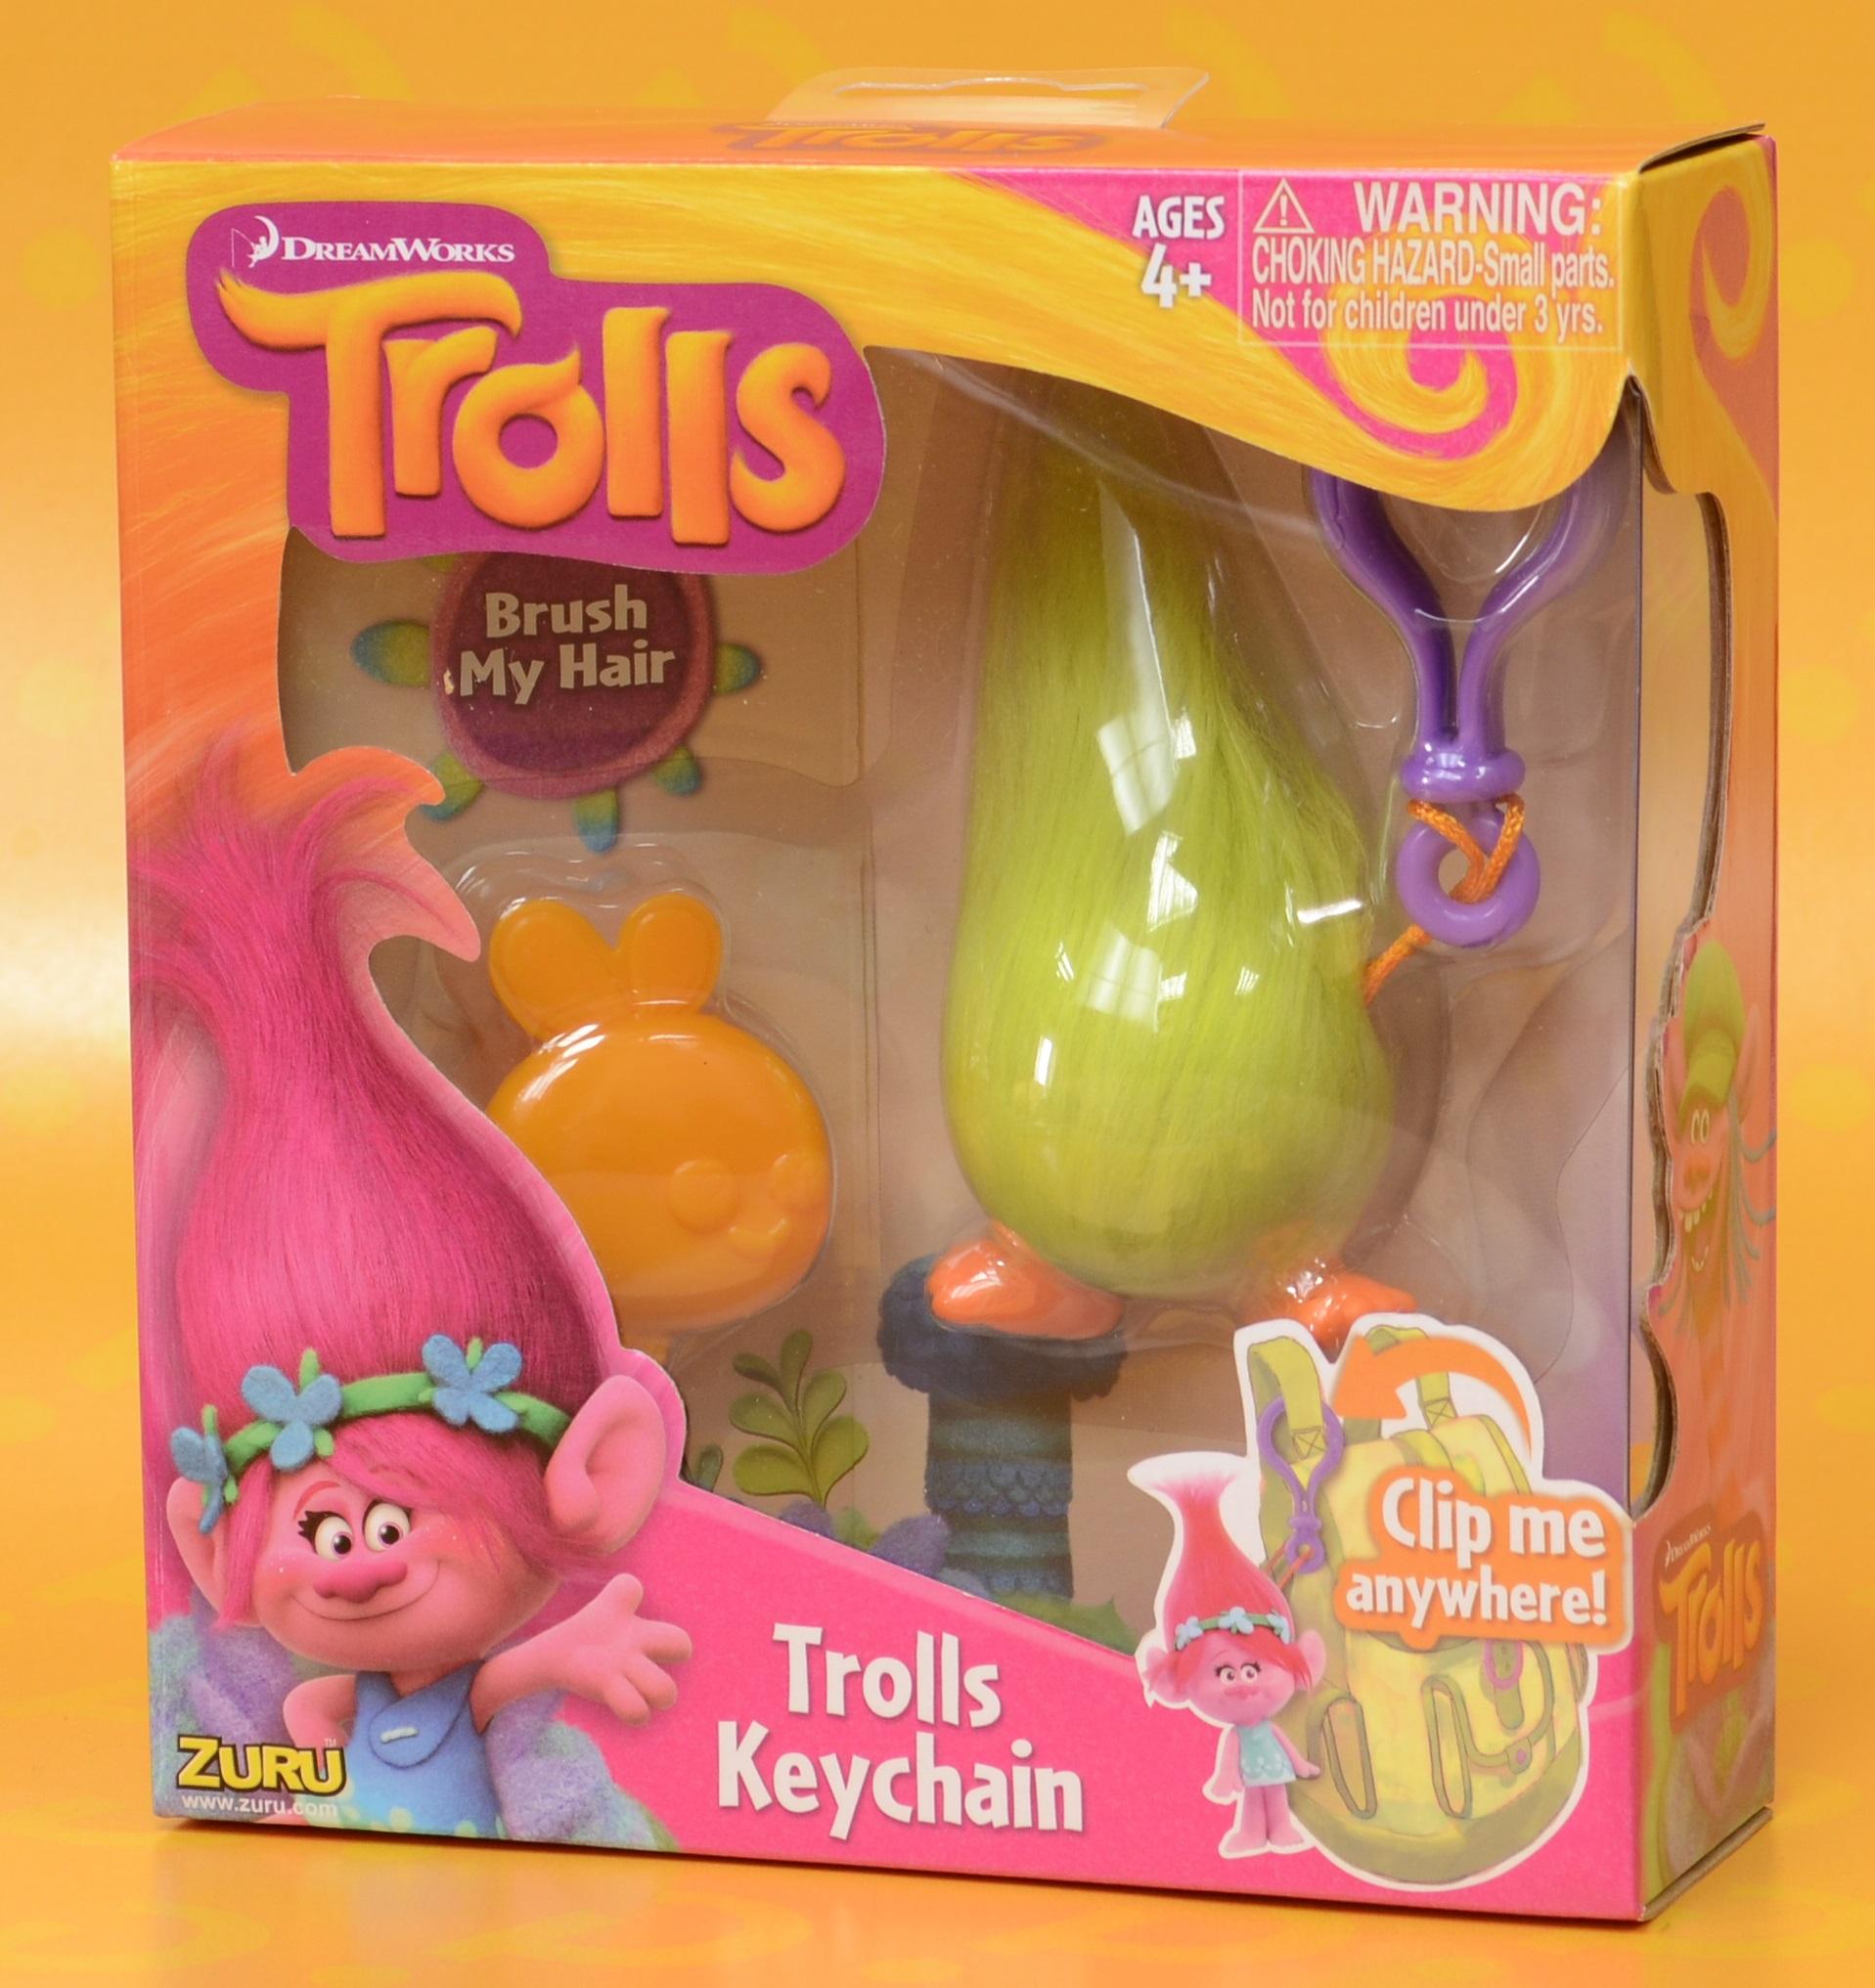 Брелок Trolls. Тролль Пушистик (Fuzzbert) мягкая игрушка trolls тролль пушистик fuzzbert